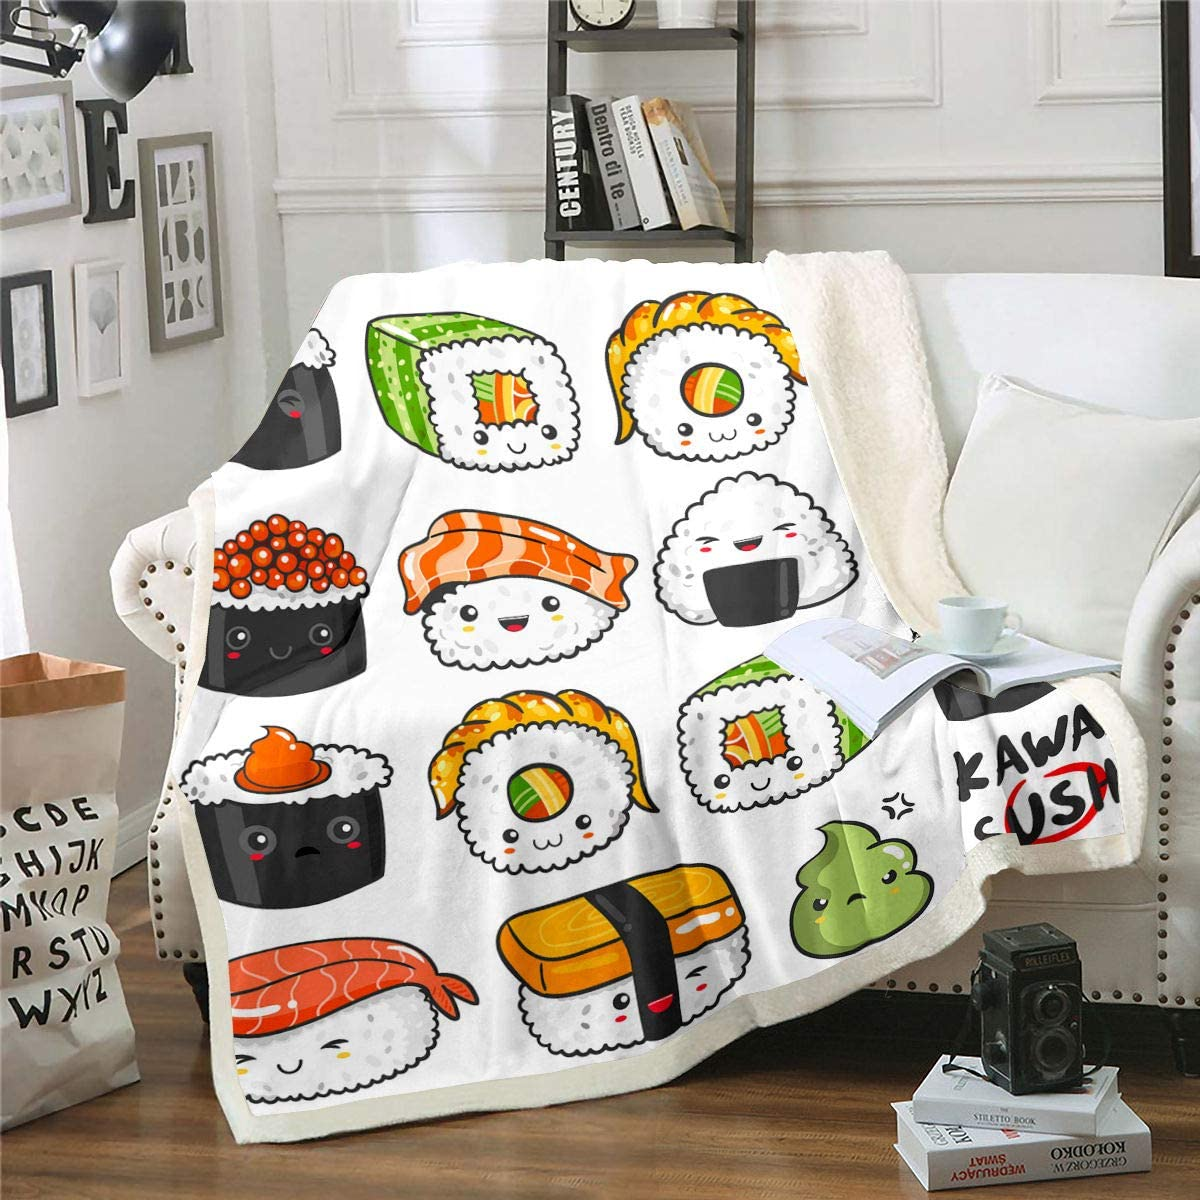 Erosebridal Sushi Pattern Flannel Blanket, Japanese Style Sherpa Blanket, Food Theme Throw Blanket for Kids Boys Girls Teens, Cute Cartoon Japanese Sushi Bed Blanket Throw 50